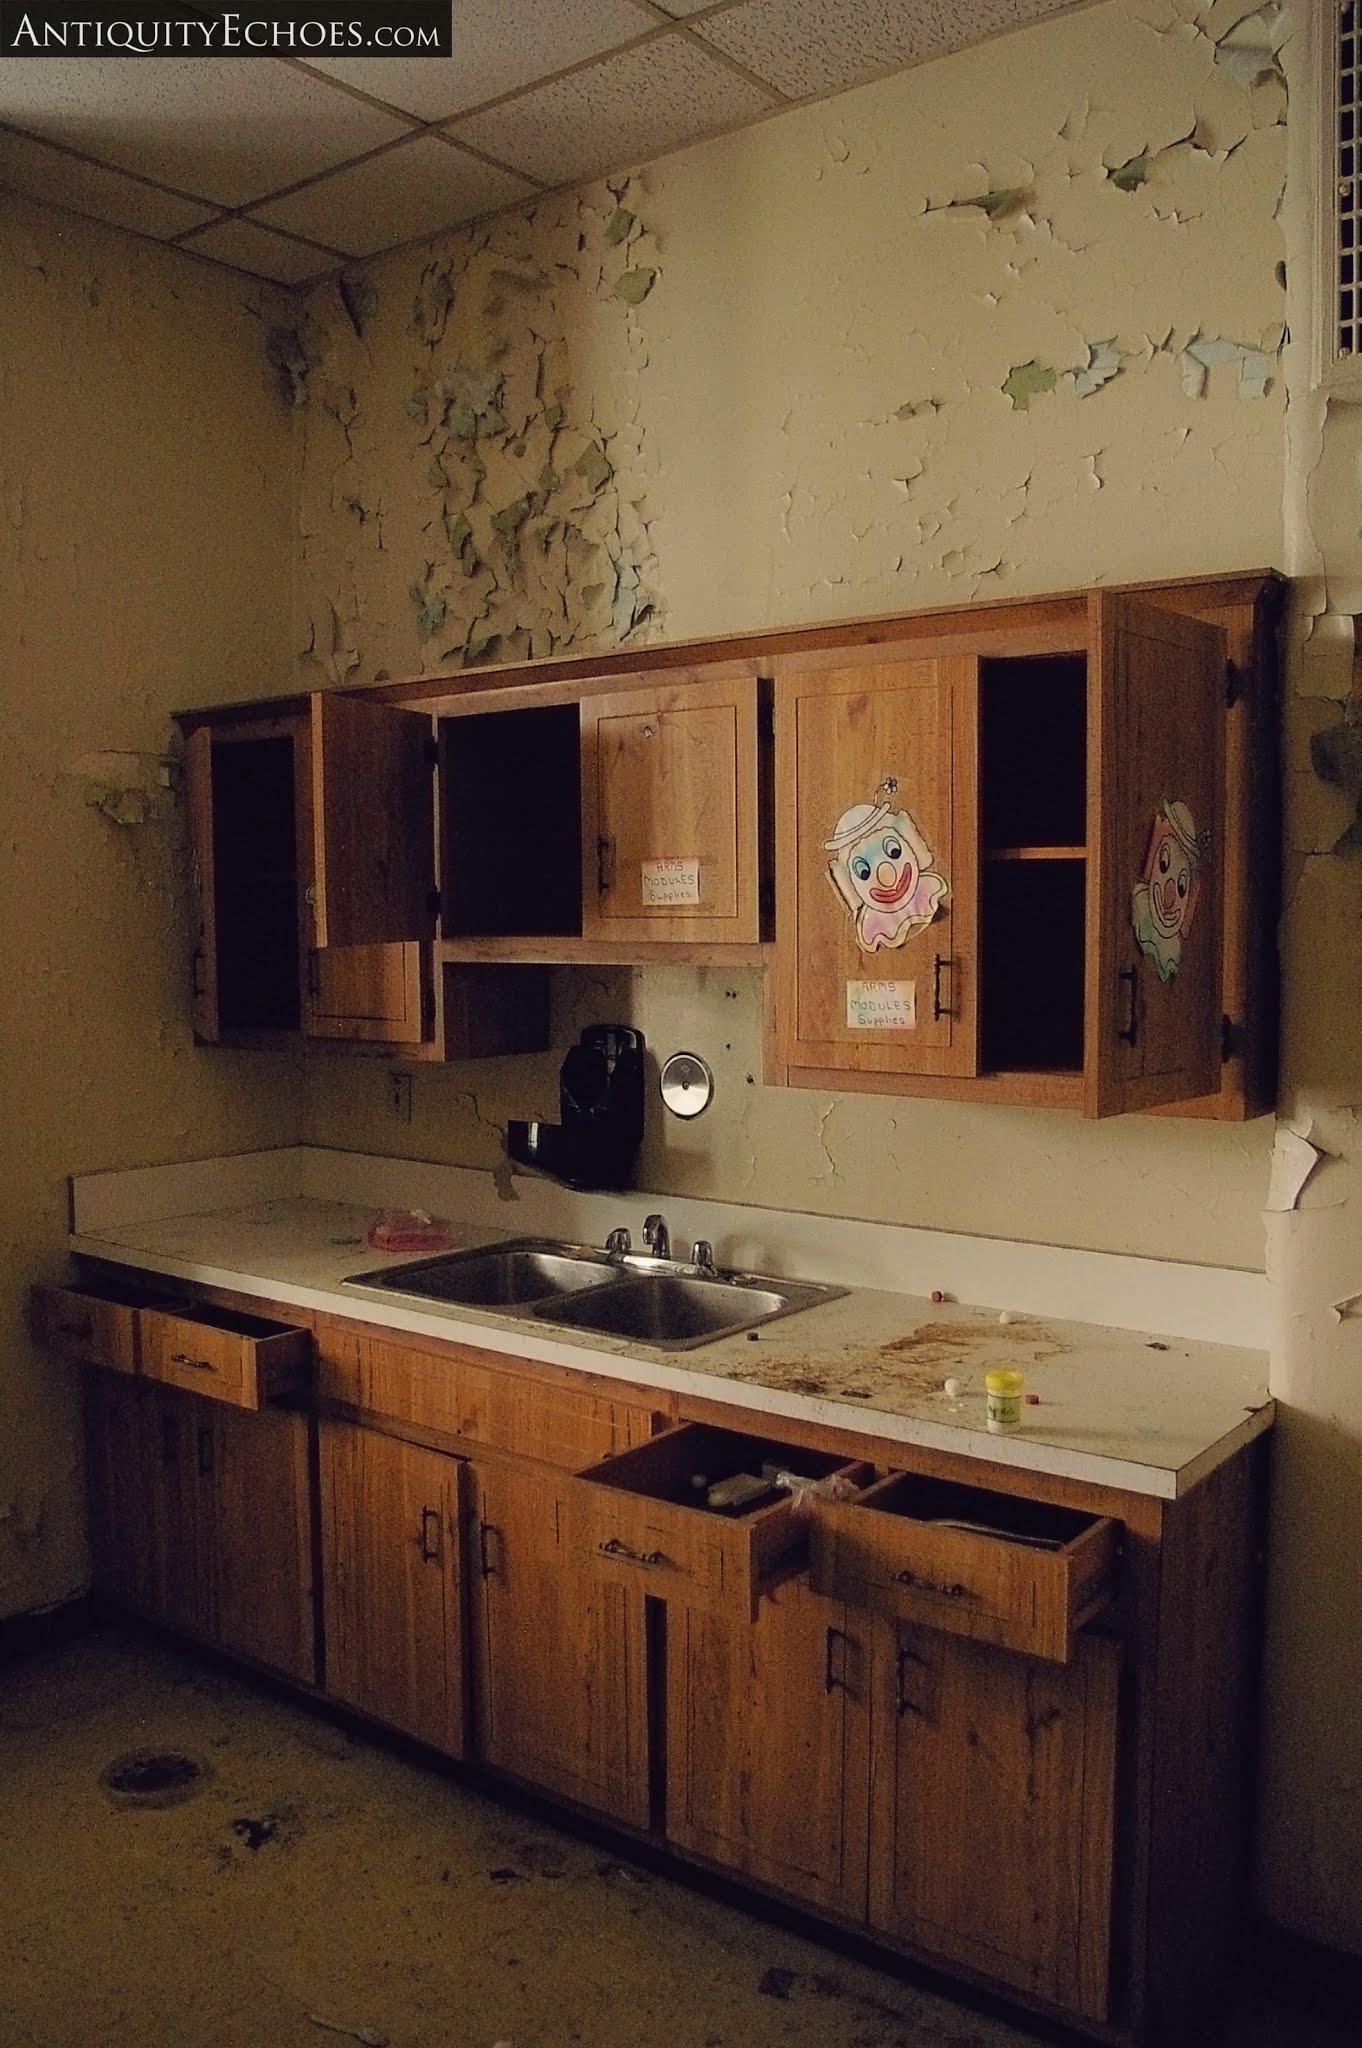 Overbrook Asylum - Literally the Worst Decor Choice